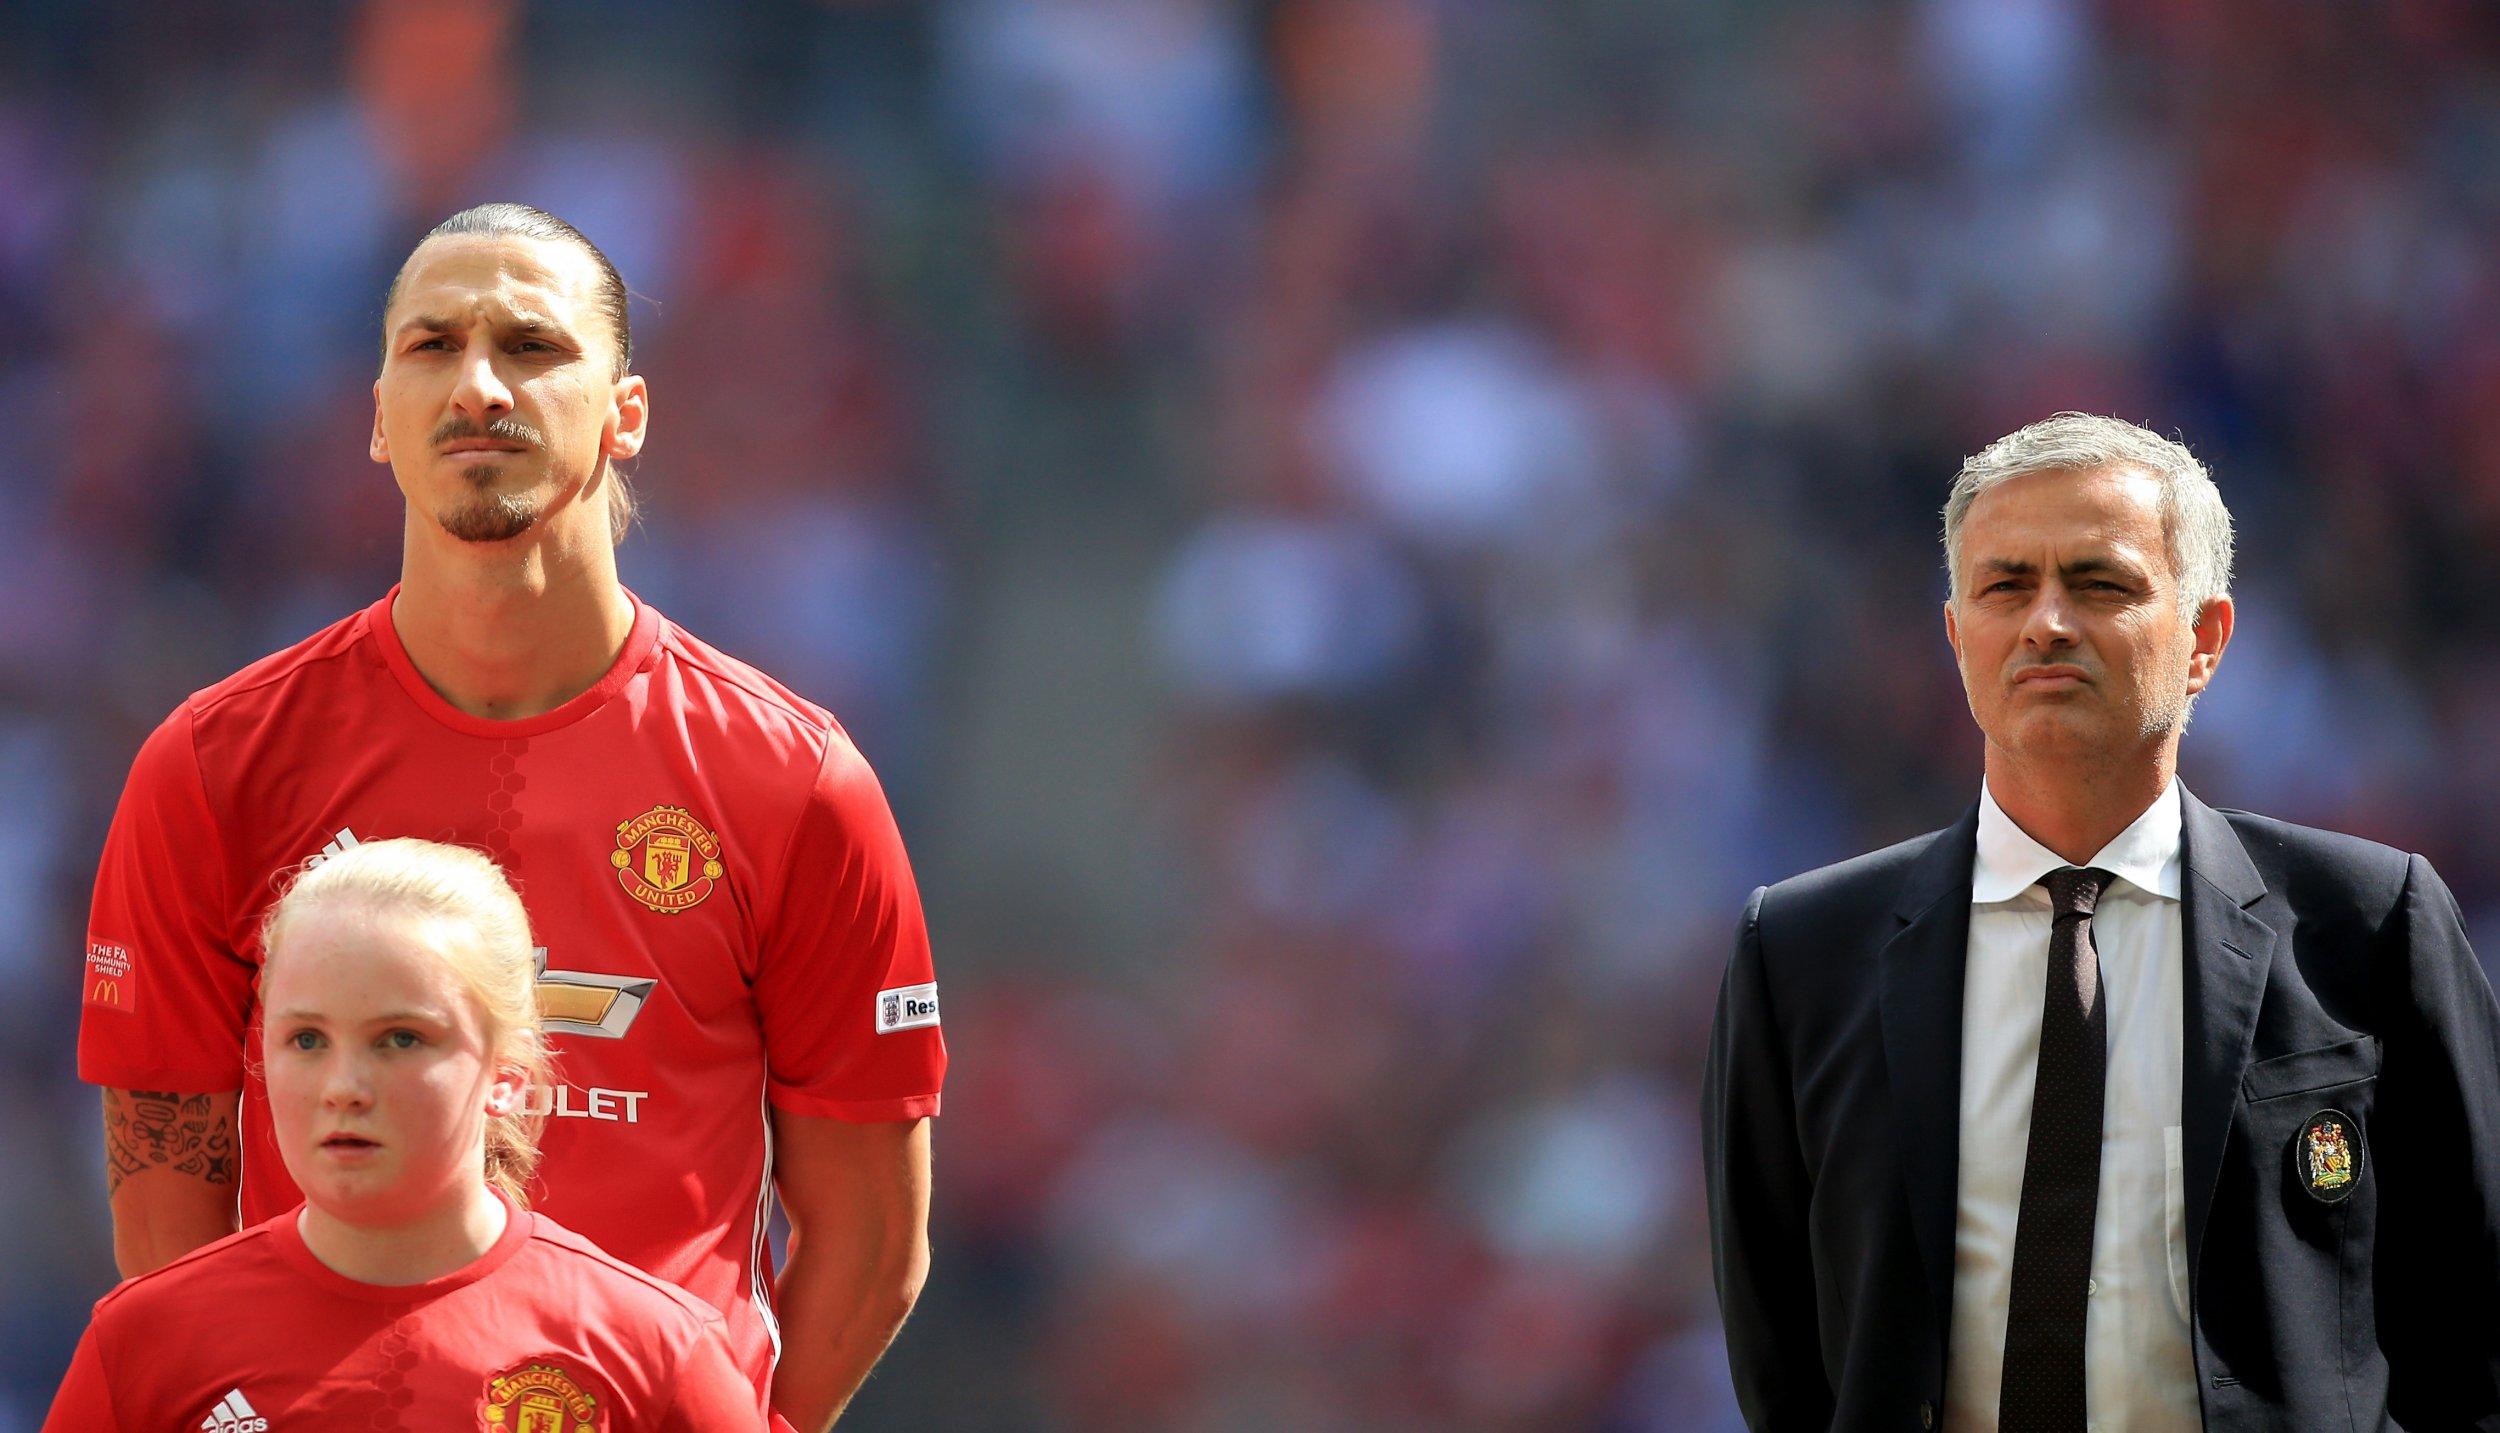 Zlatan Ibrahimovic with Jose Mourinho